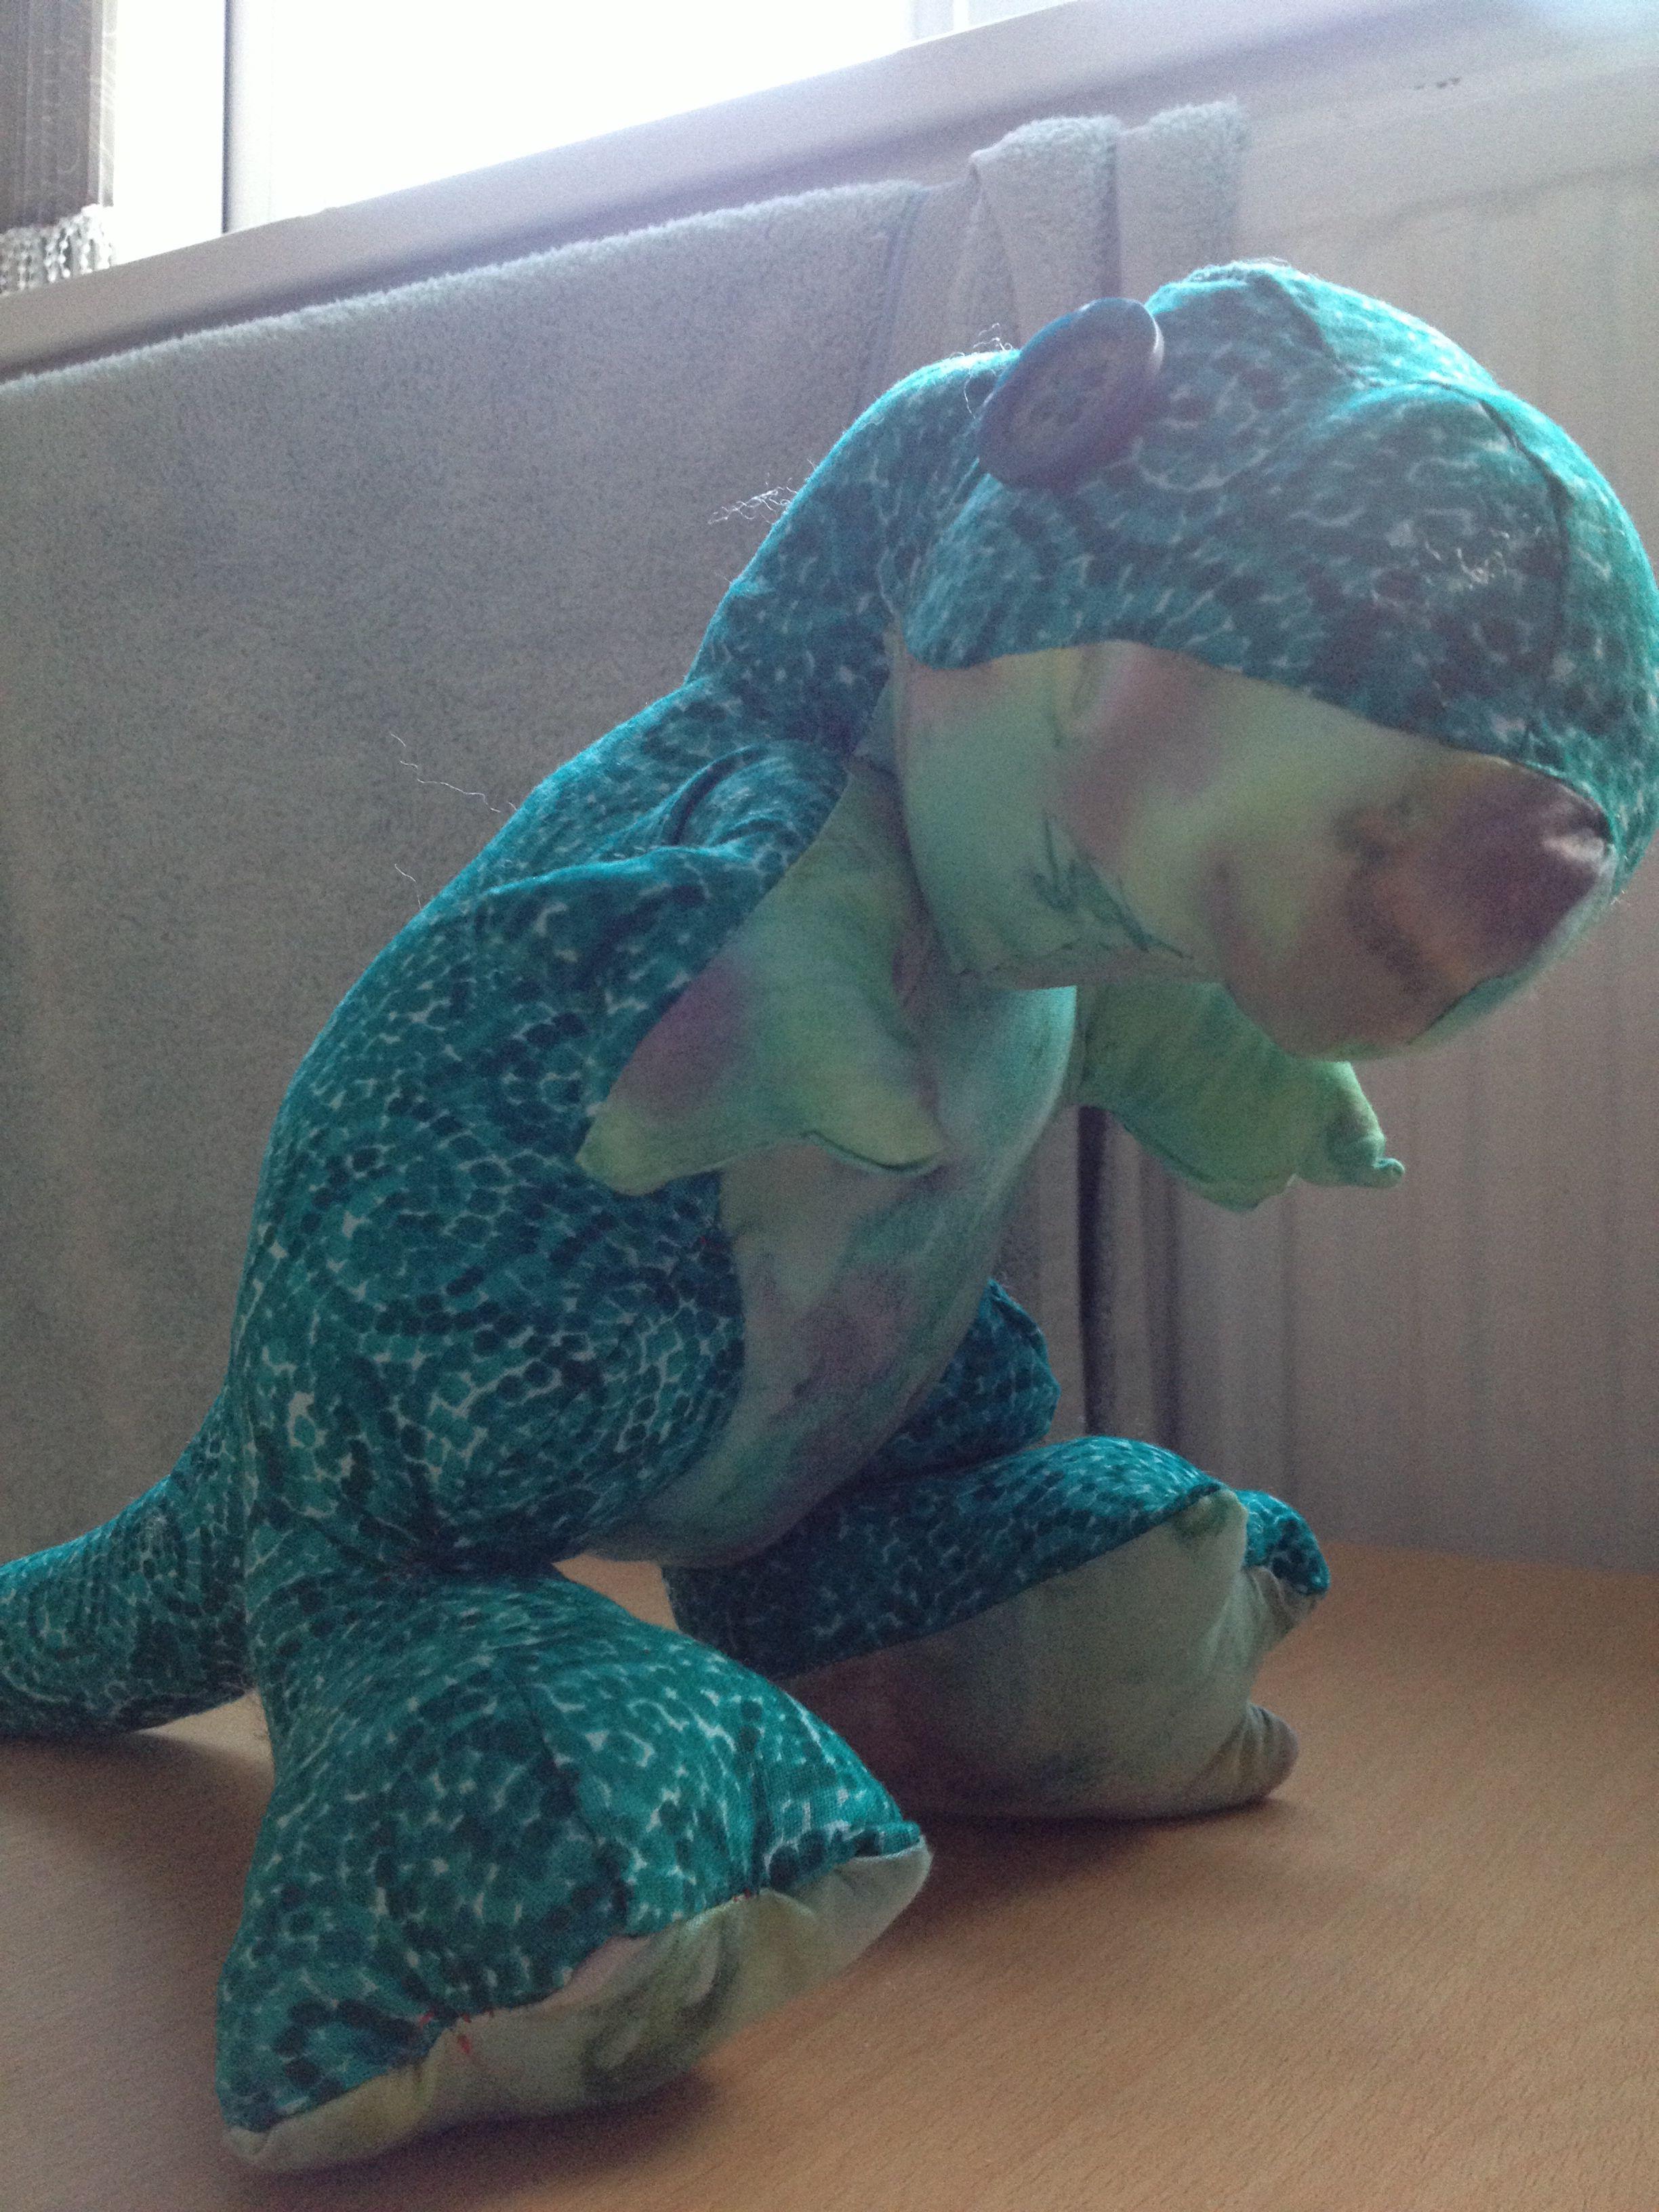 12++ T rex stuffed animal images